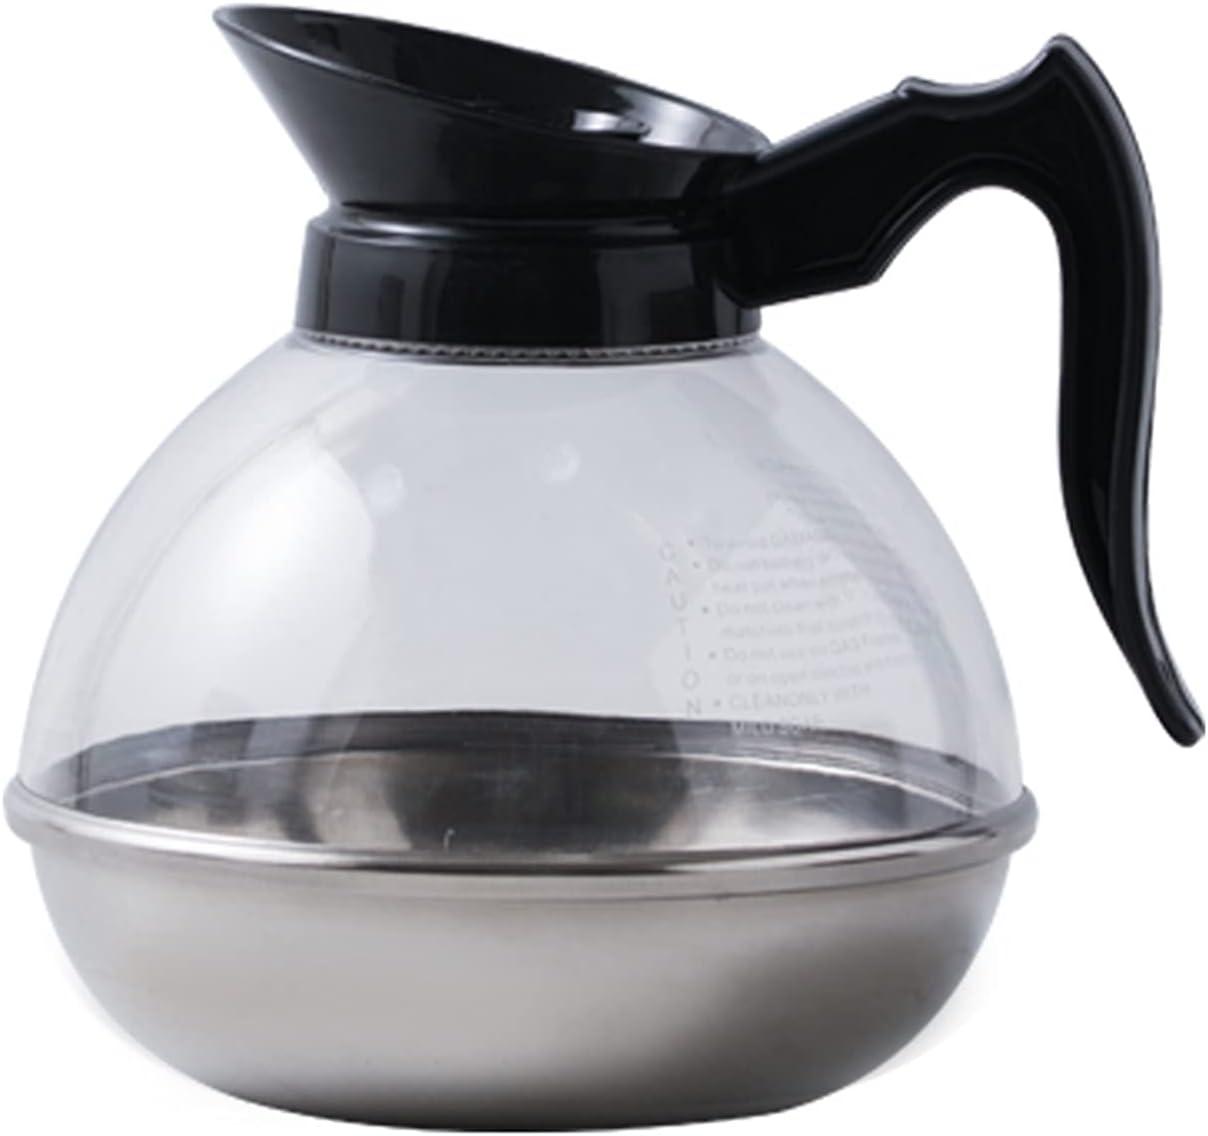 Xu Yuan Jia-Shop Cafeteras 1800 ml de café Caldera de Acero Inoxidable Cafetera Máquina de la Prensa Francesa de café Doble Pared con Aislamiento Cafetera Jarra para Cafetera